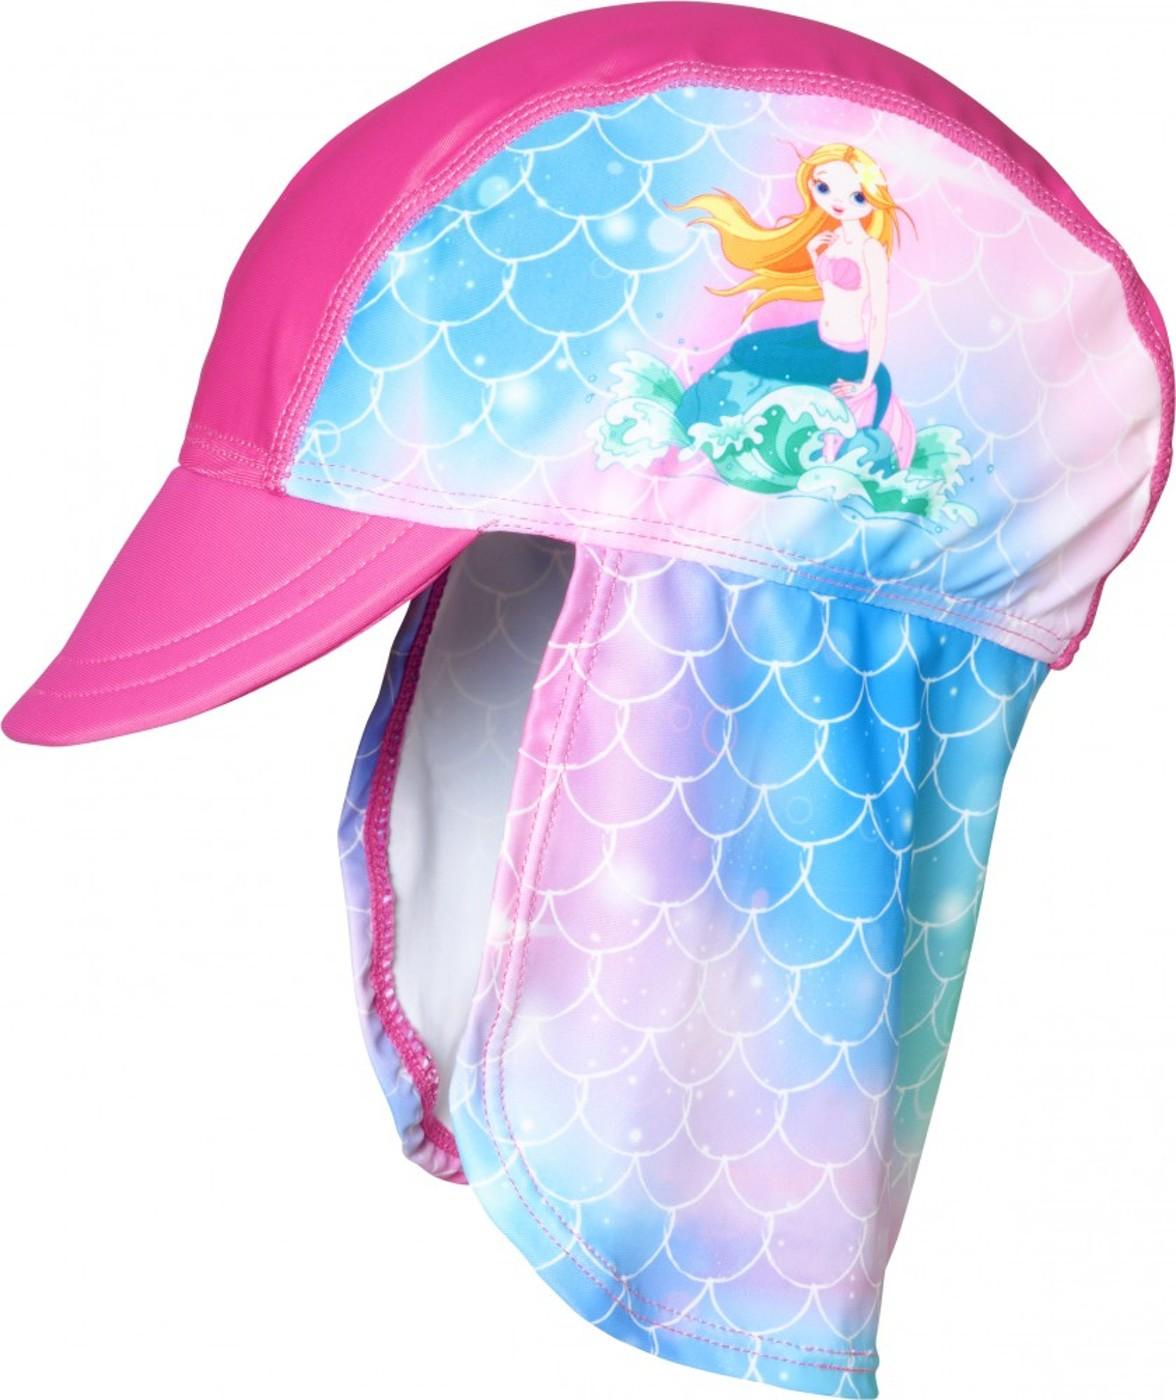 UV-Schutz Mütze Meerjungfrau PLAYSHOES